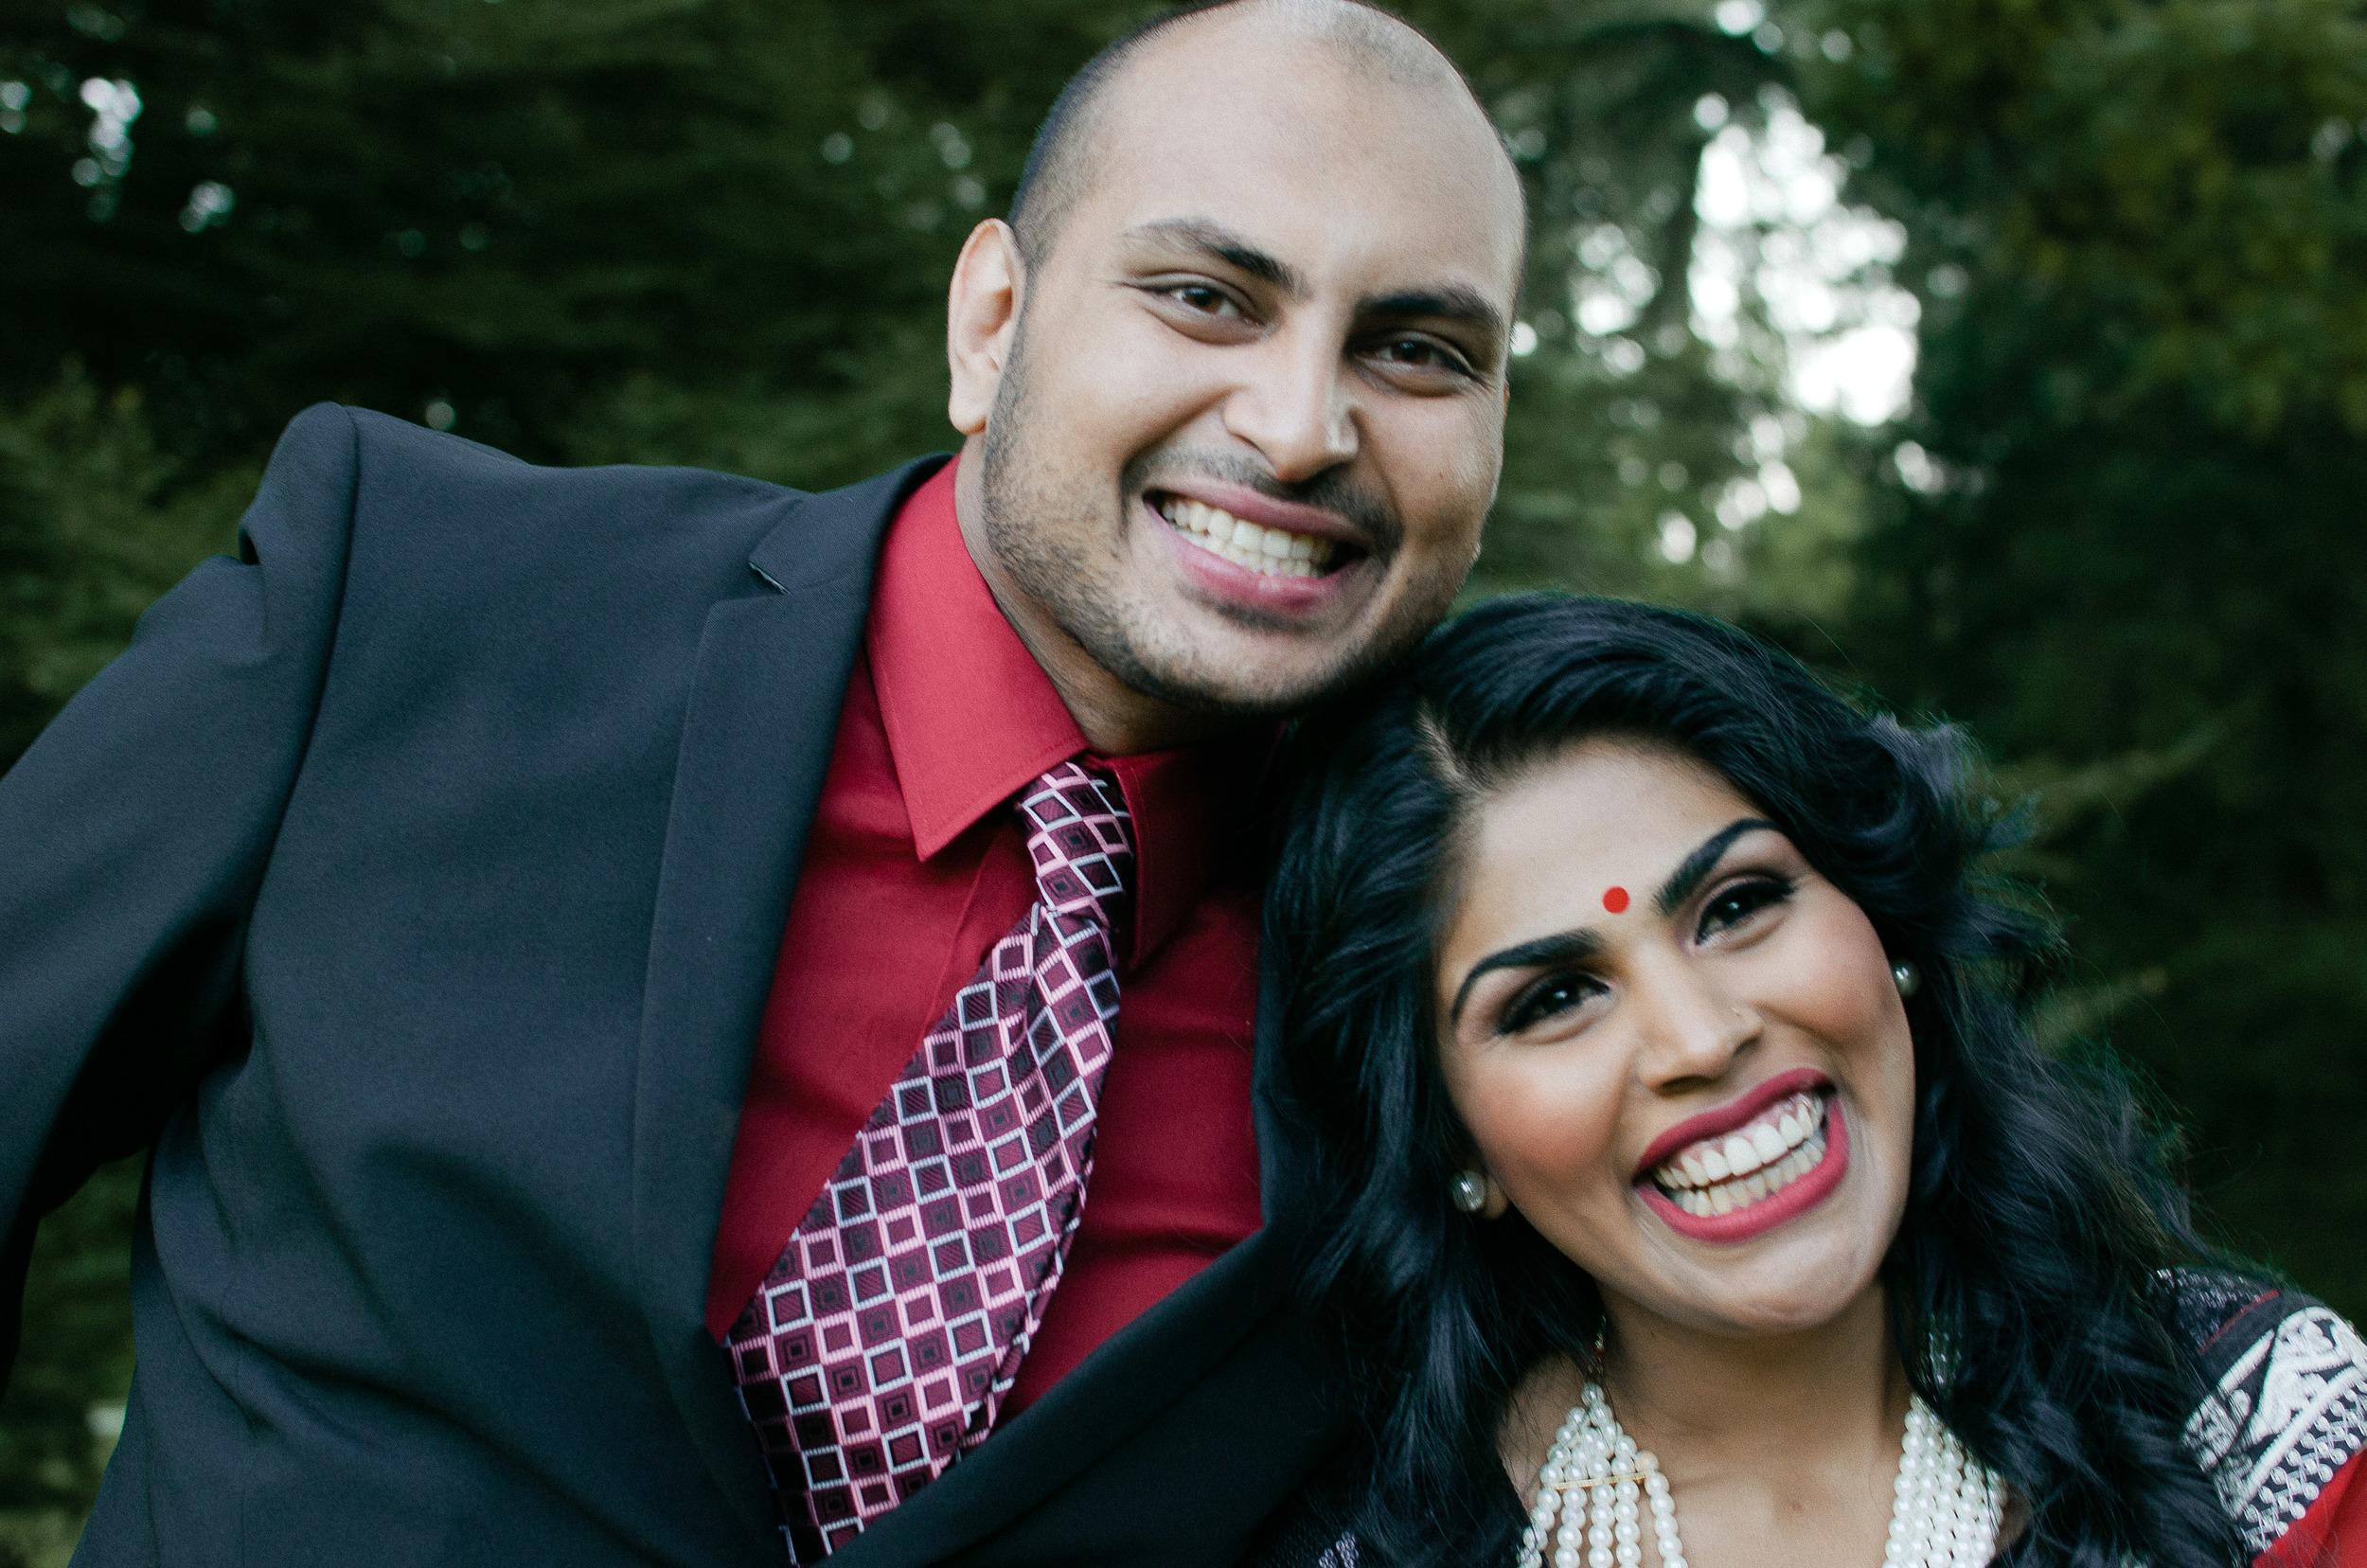 Amresh + Salona_Katie Powell Photography Vancouver Engagement Stanley Park Portraits-12.jpg